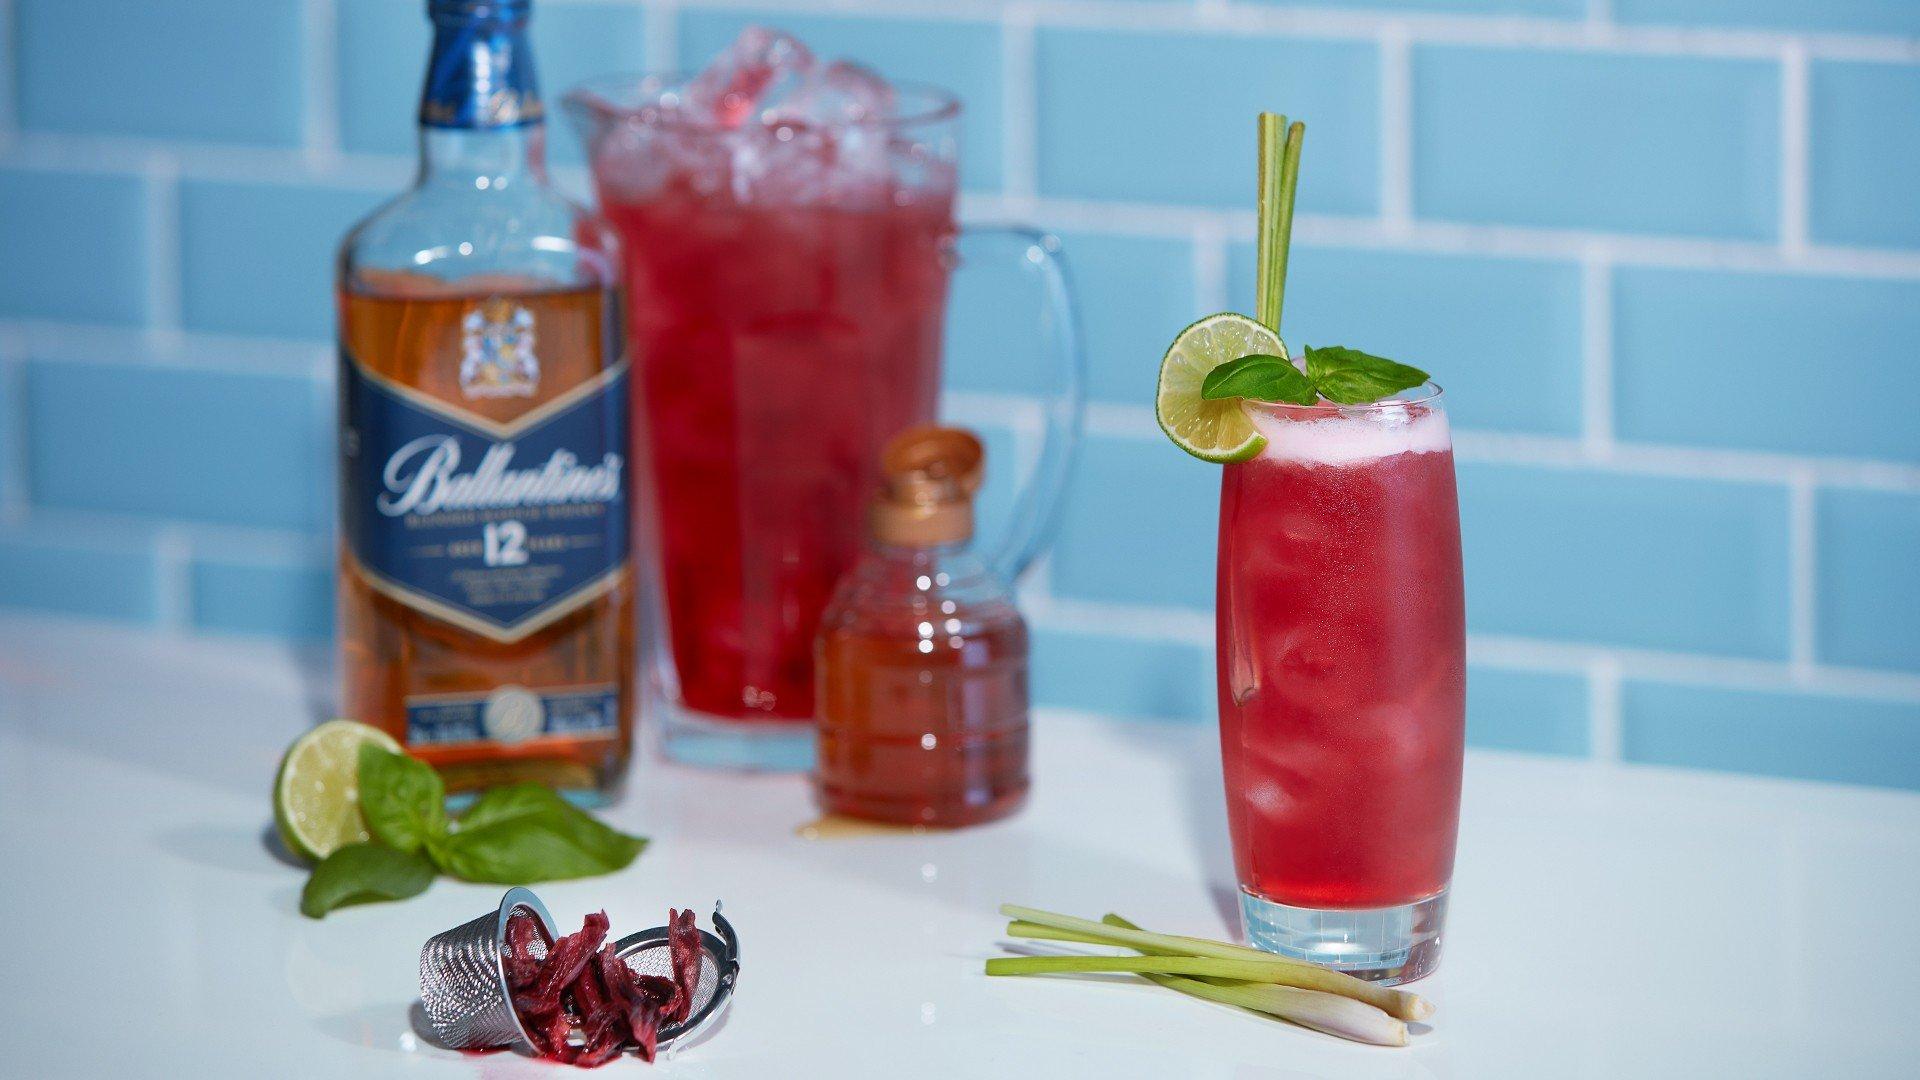 Hibiscus iced tea with Ballantine's 12